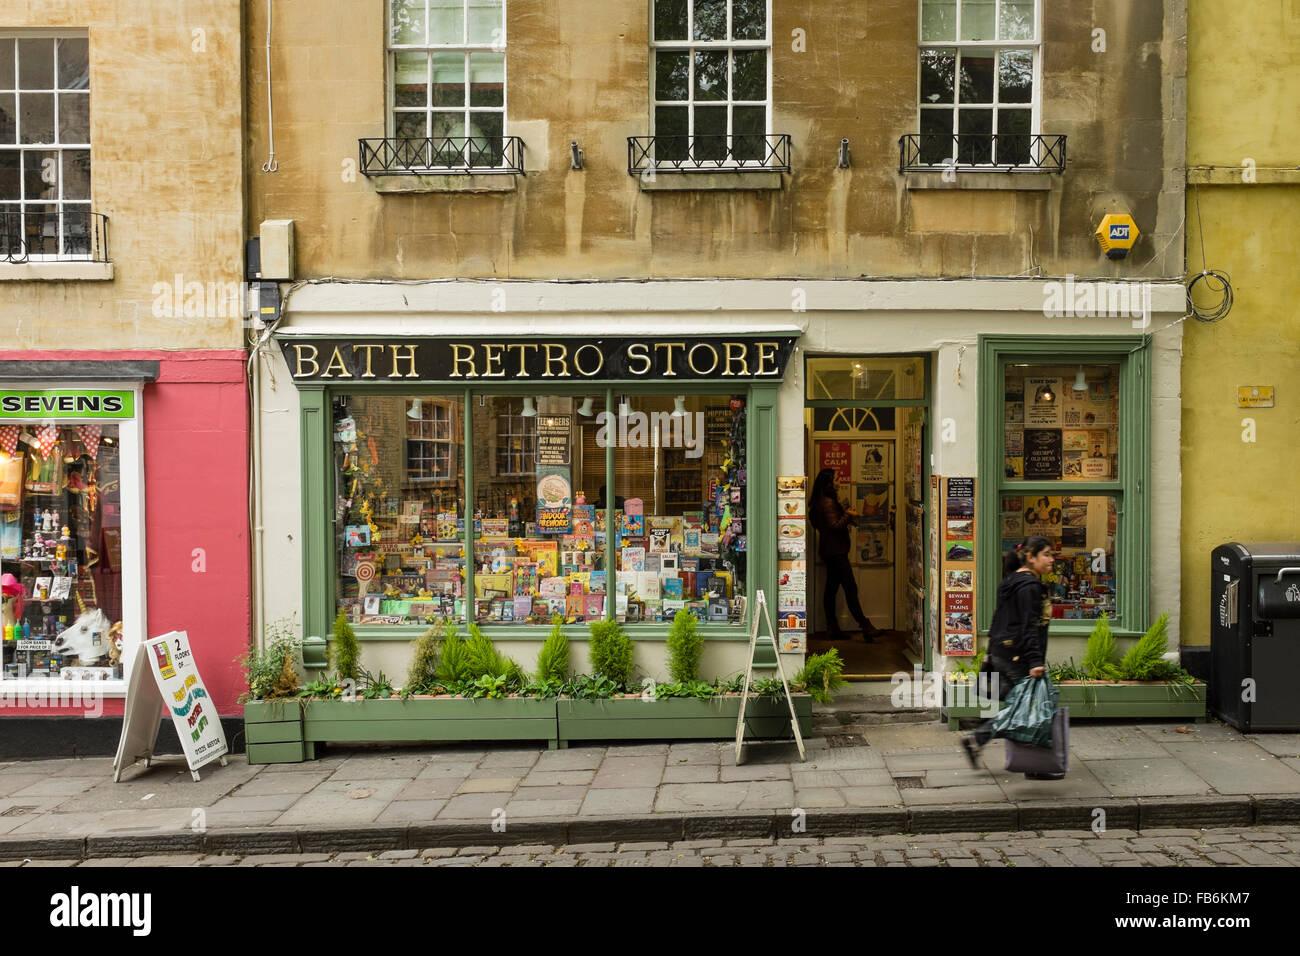 Bath Retro Store in Abbey Green, Bath, Somerset, UK Stock Photo ...